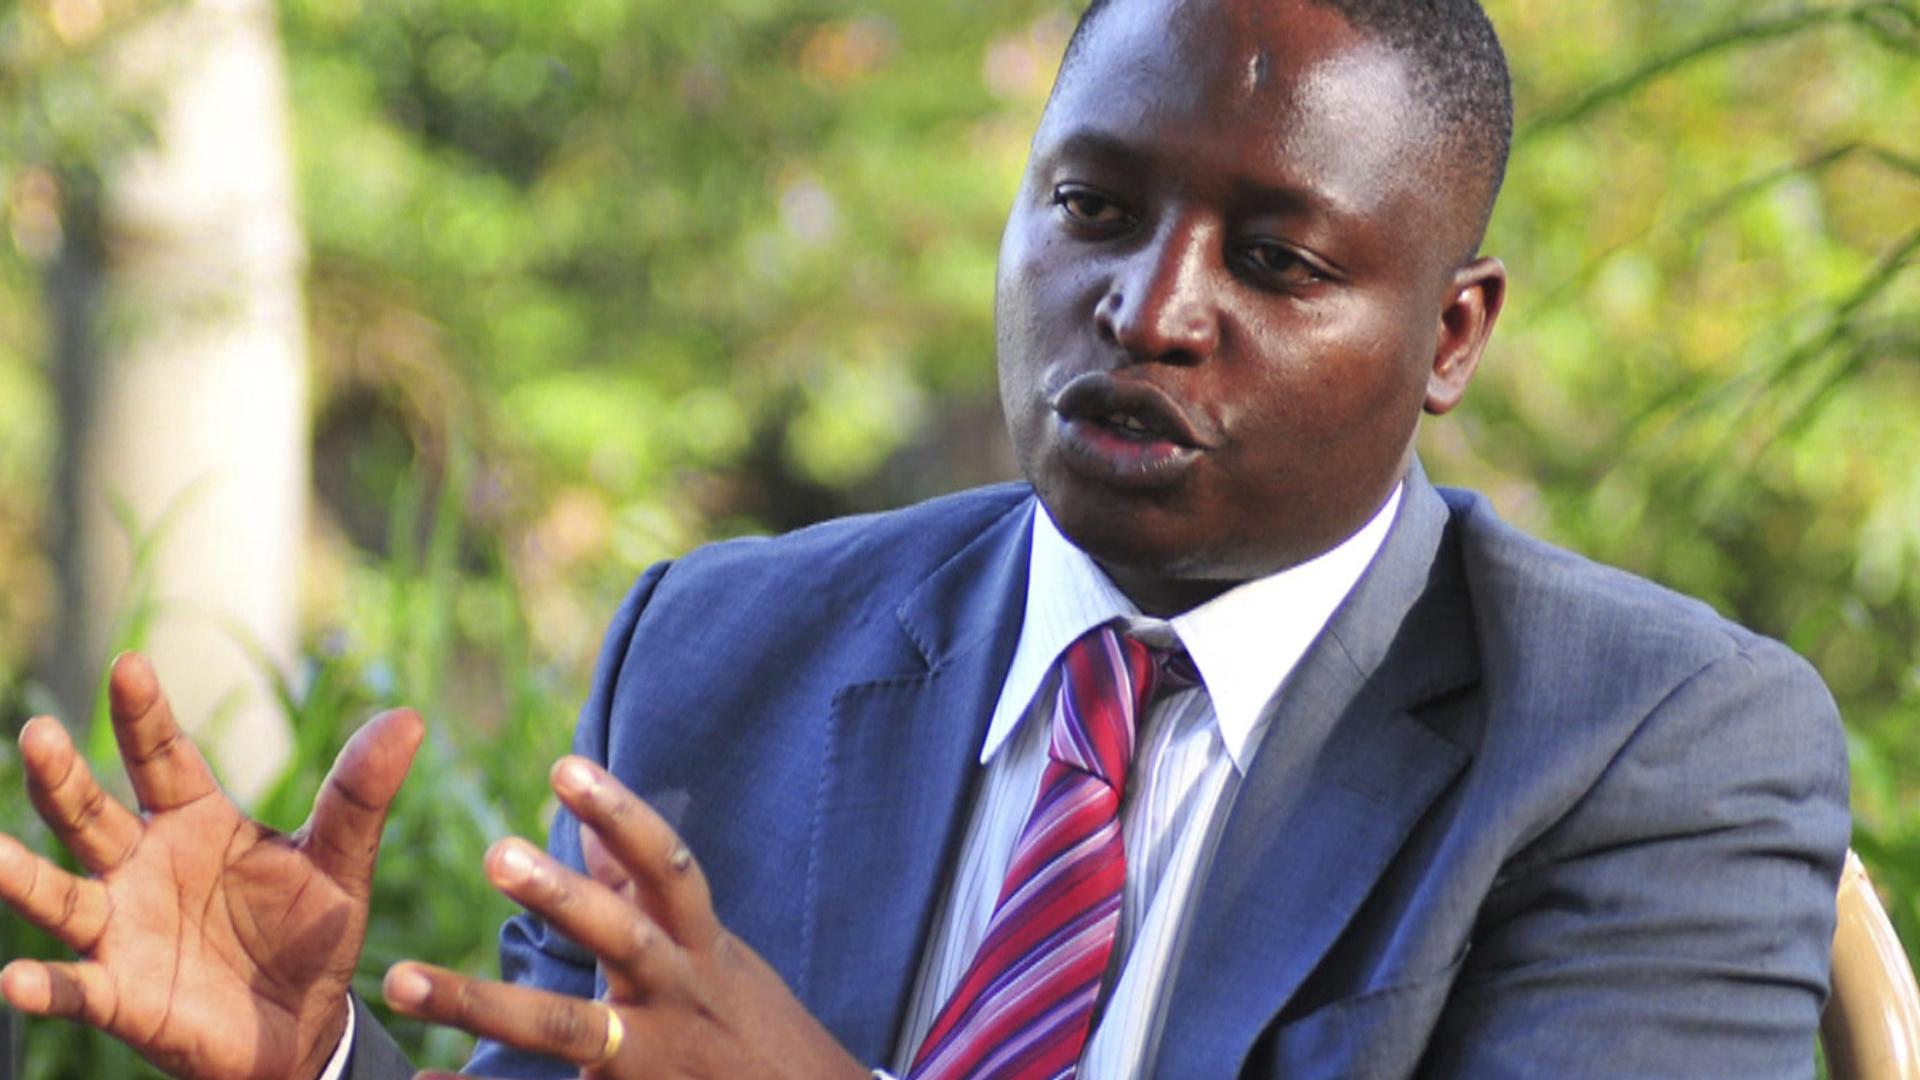 American ties to Uganda's anti-gay law?